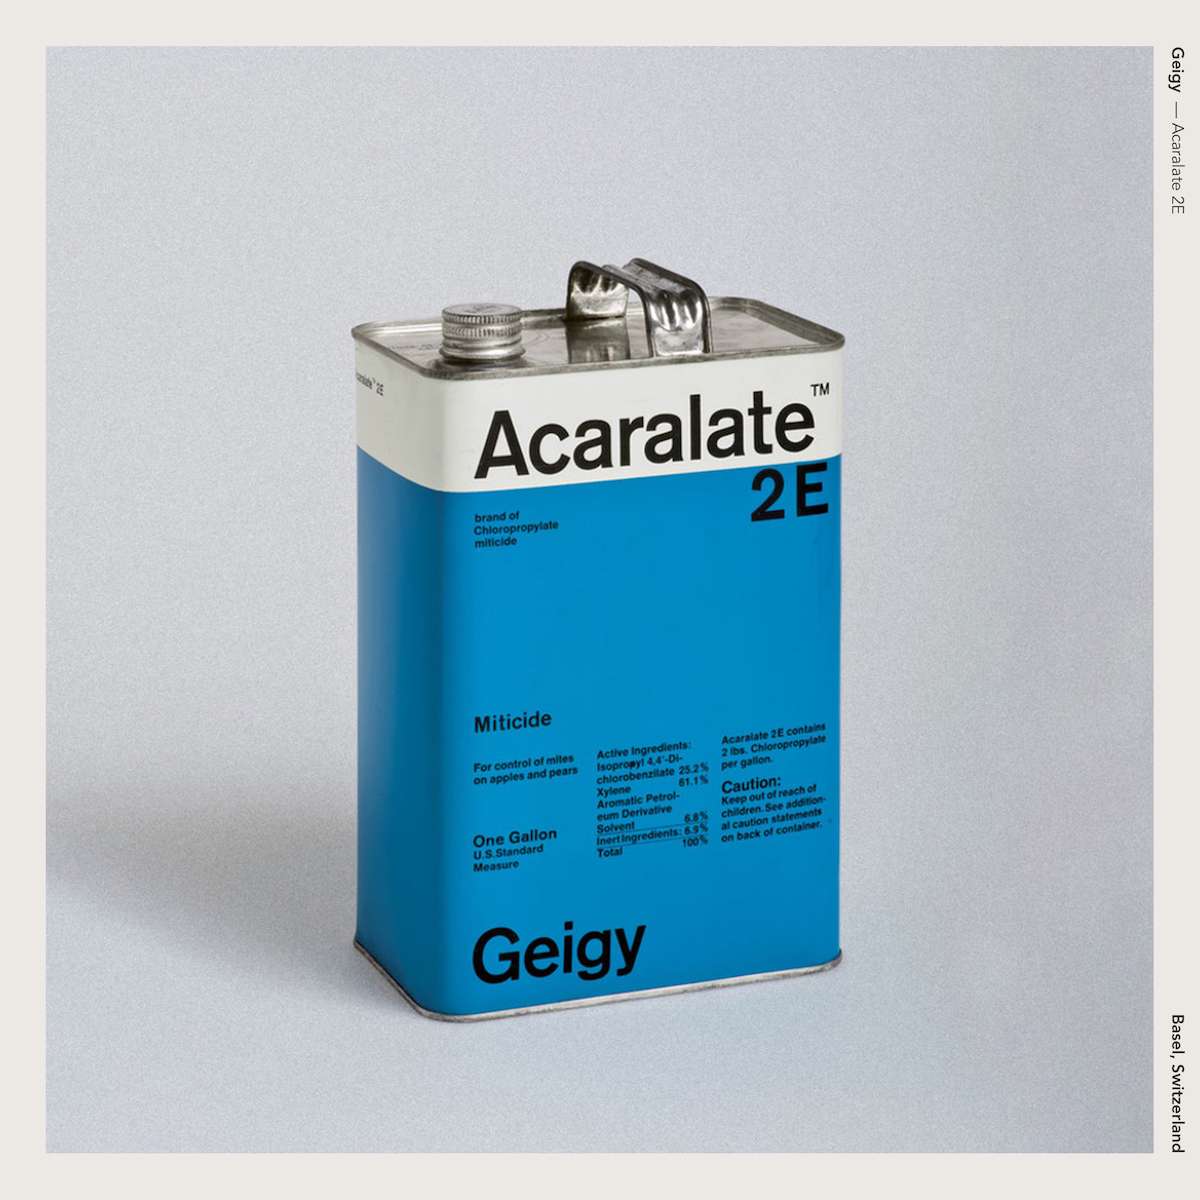 Geigy — Acaralate 2E